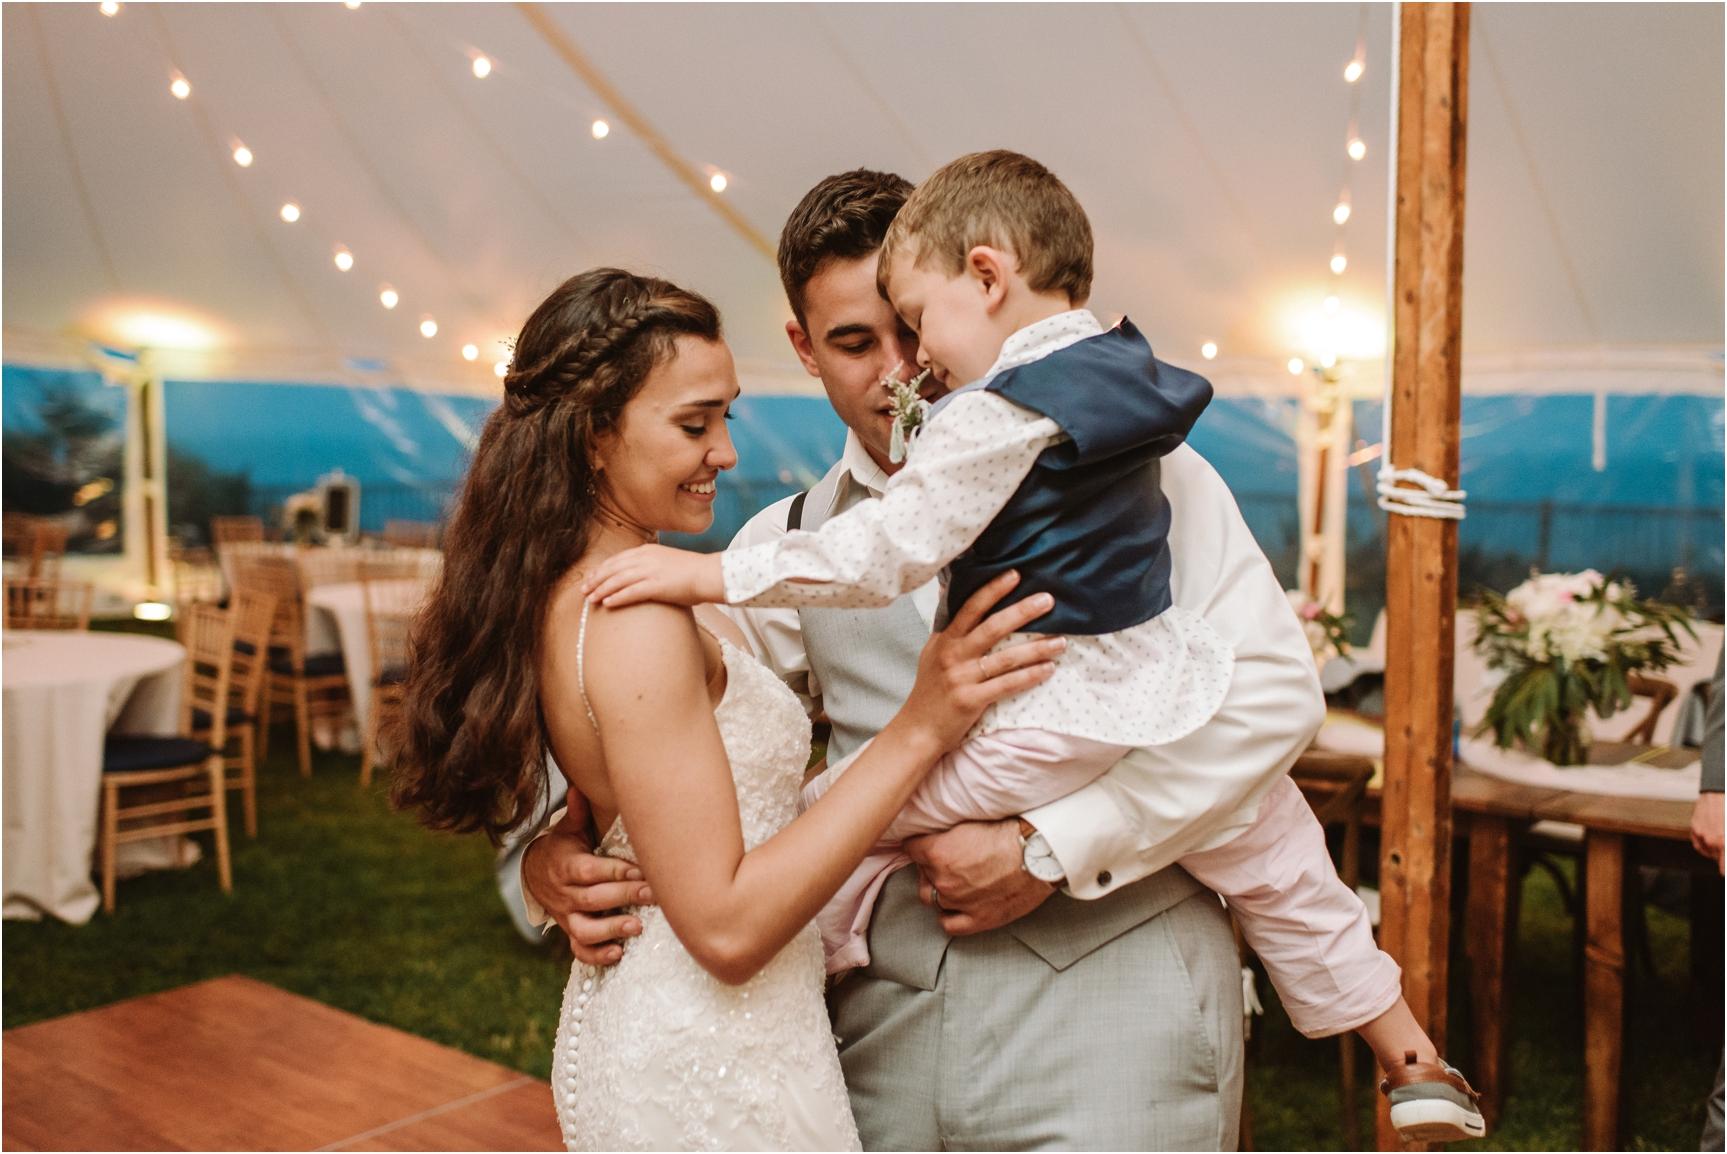 Sarah & Sam Pelham House Cape Cod Wedding Photographer-256.jpg